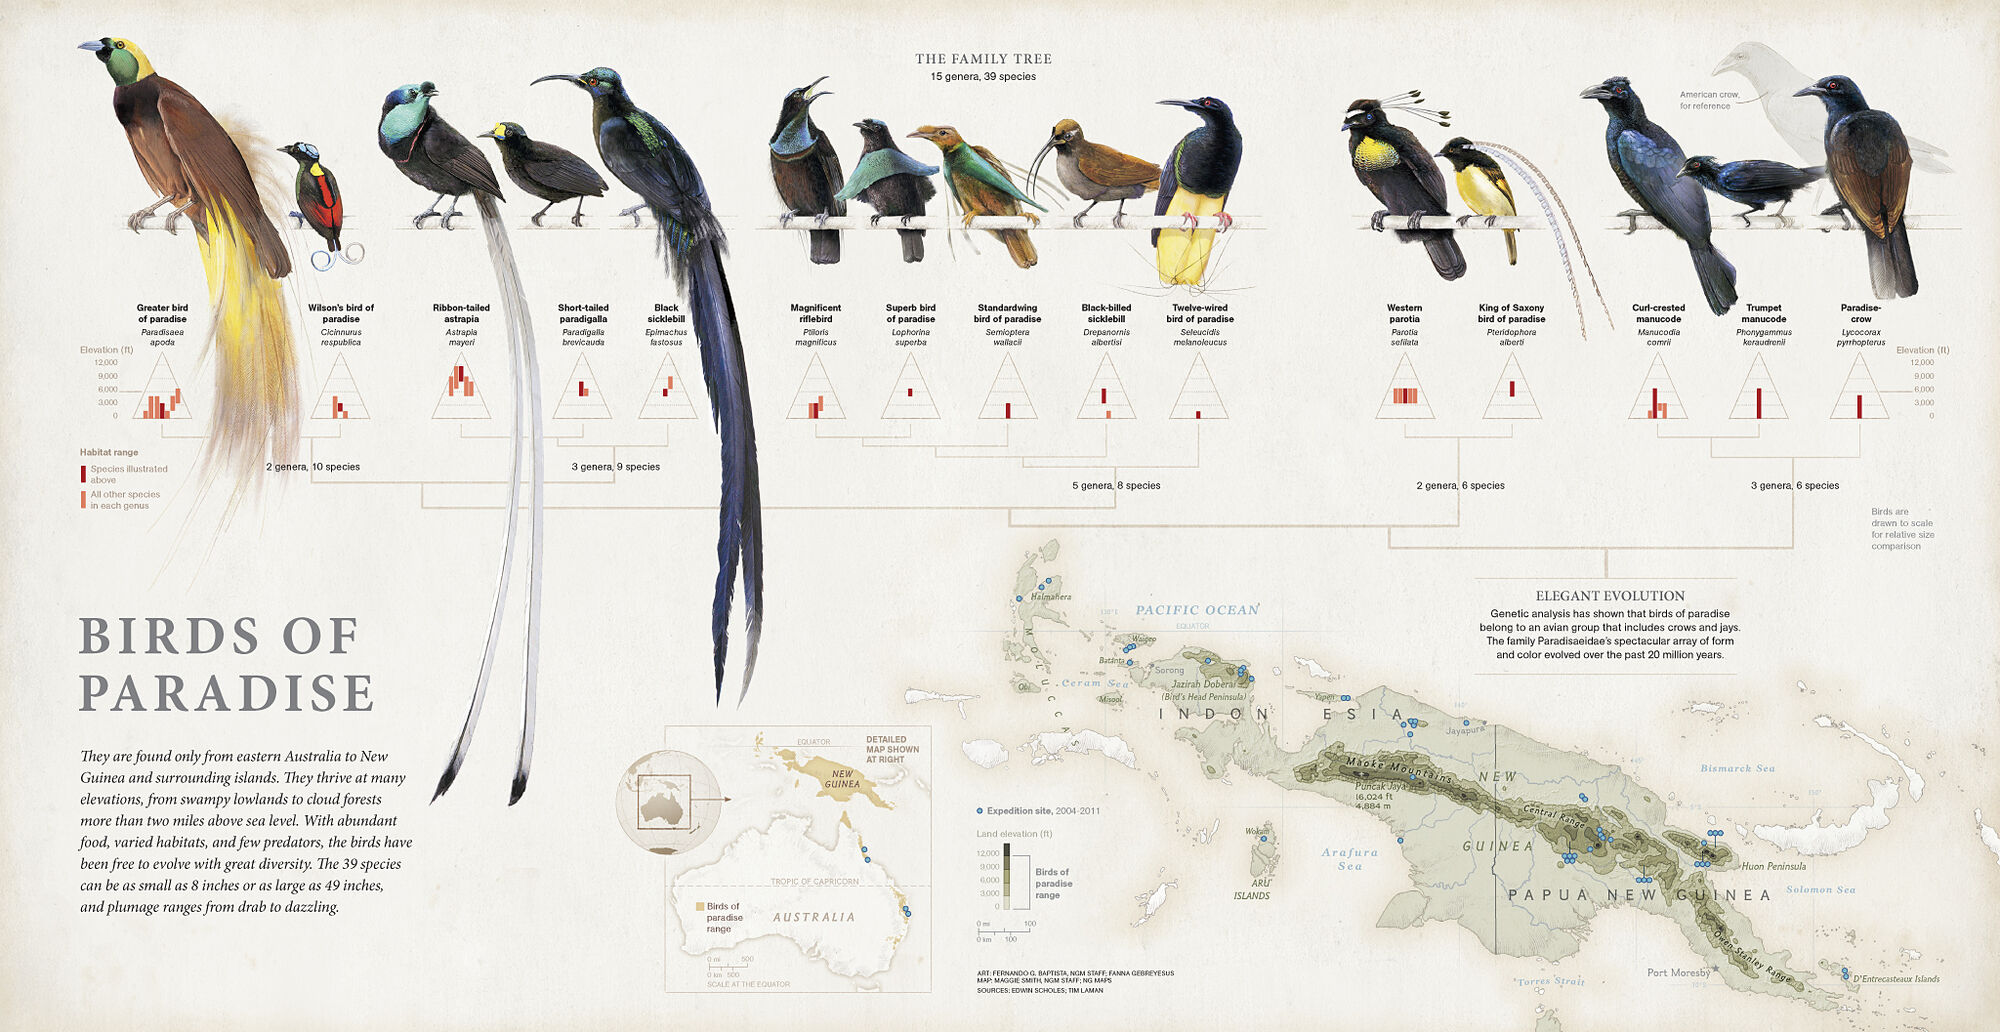 Birds of Paradise | Beast Wars Transformers Wiki | FANDOM powered by ...